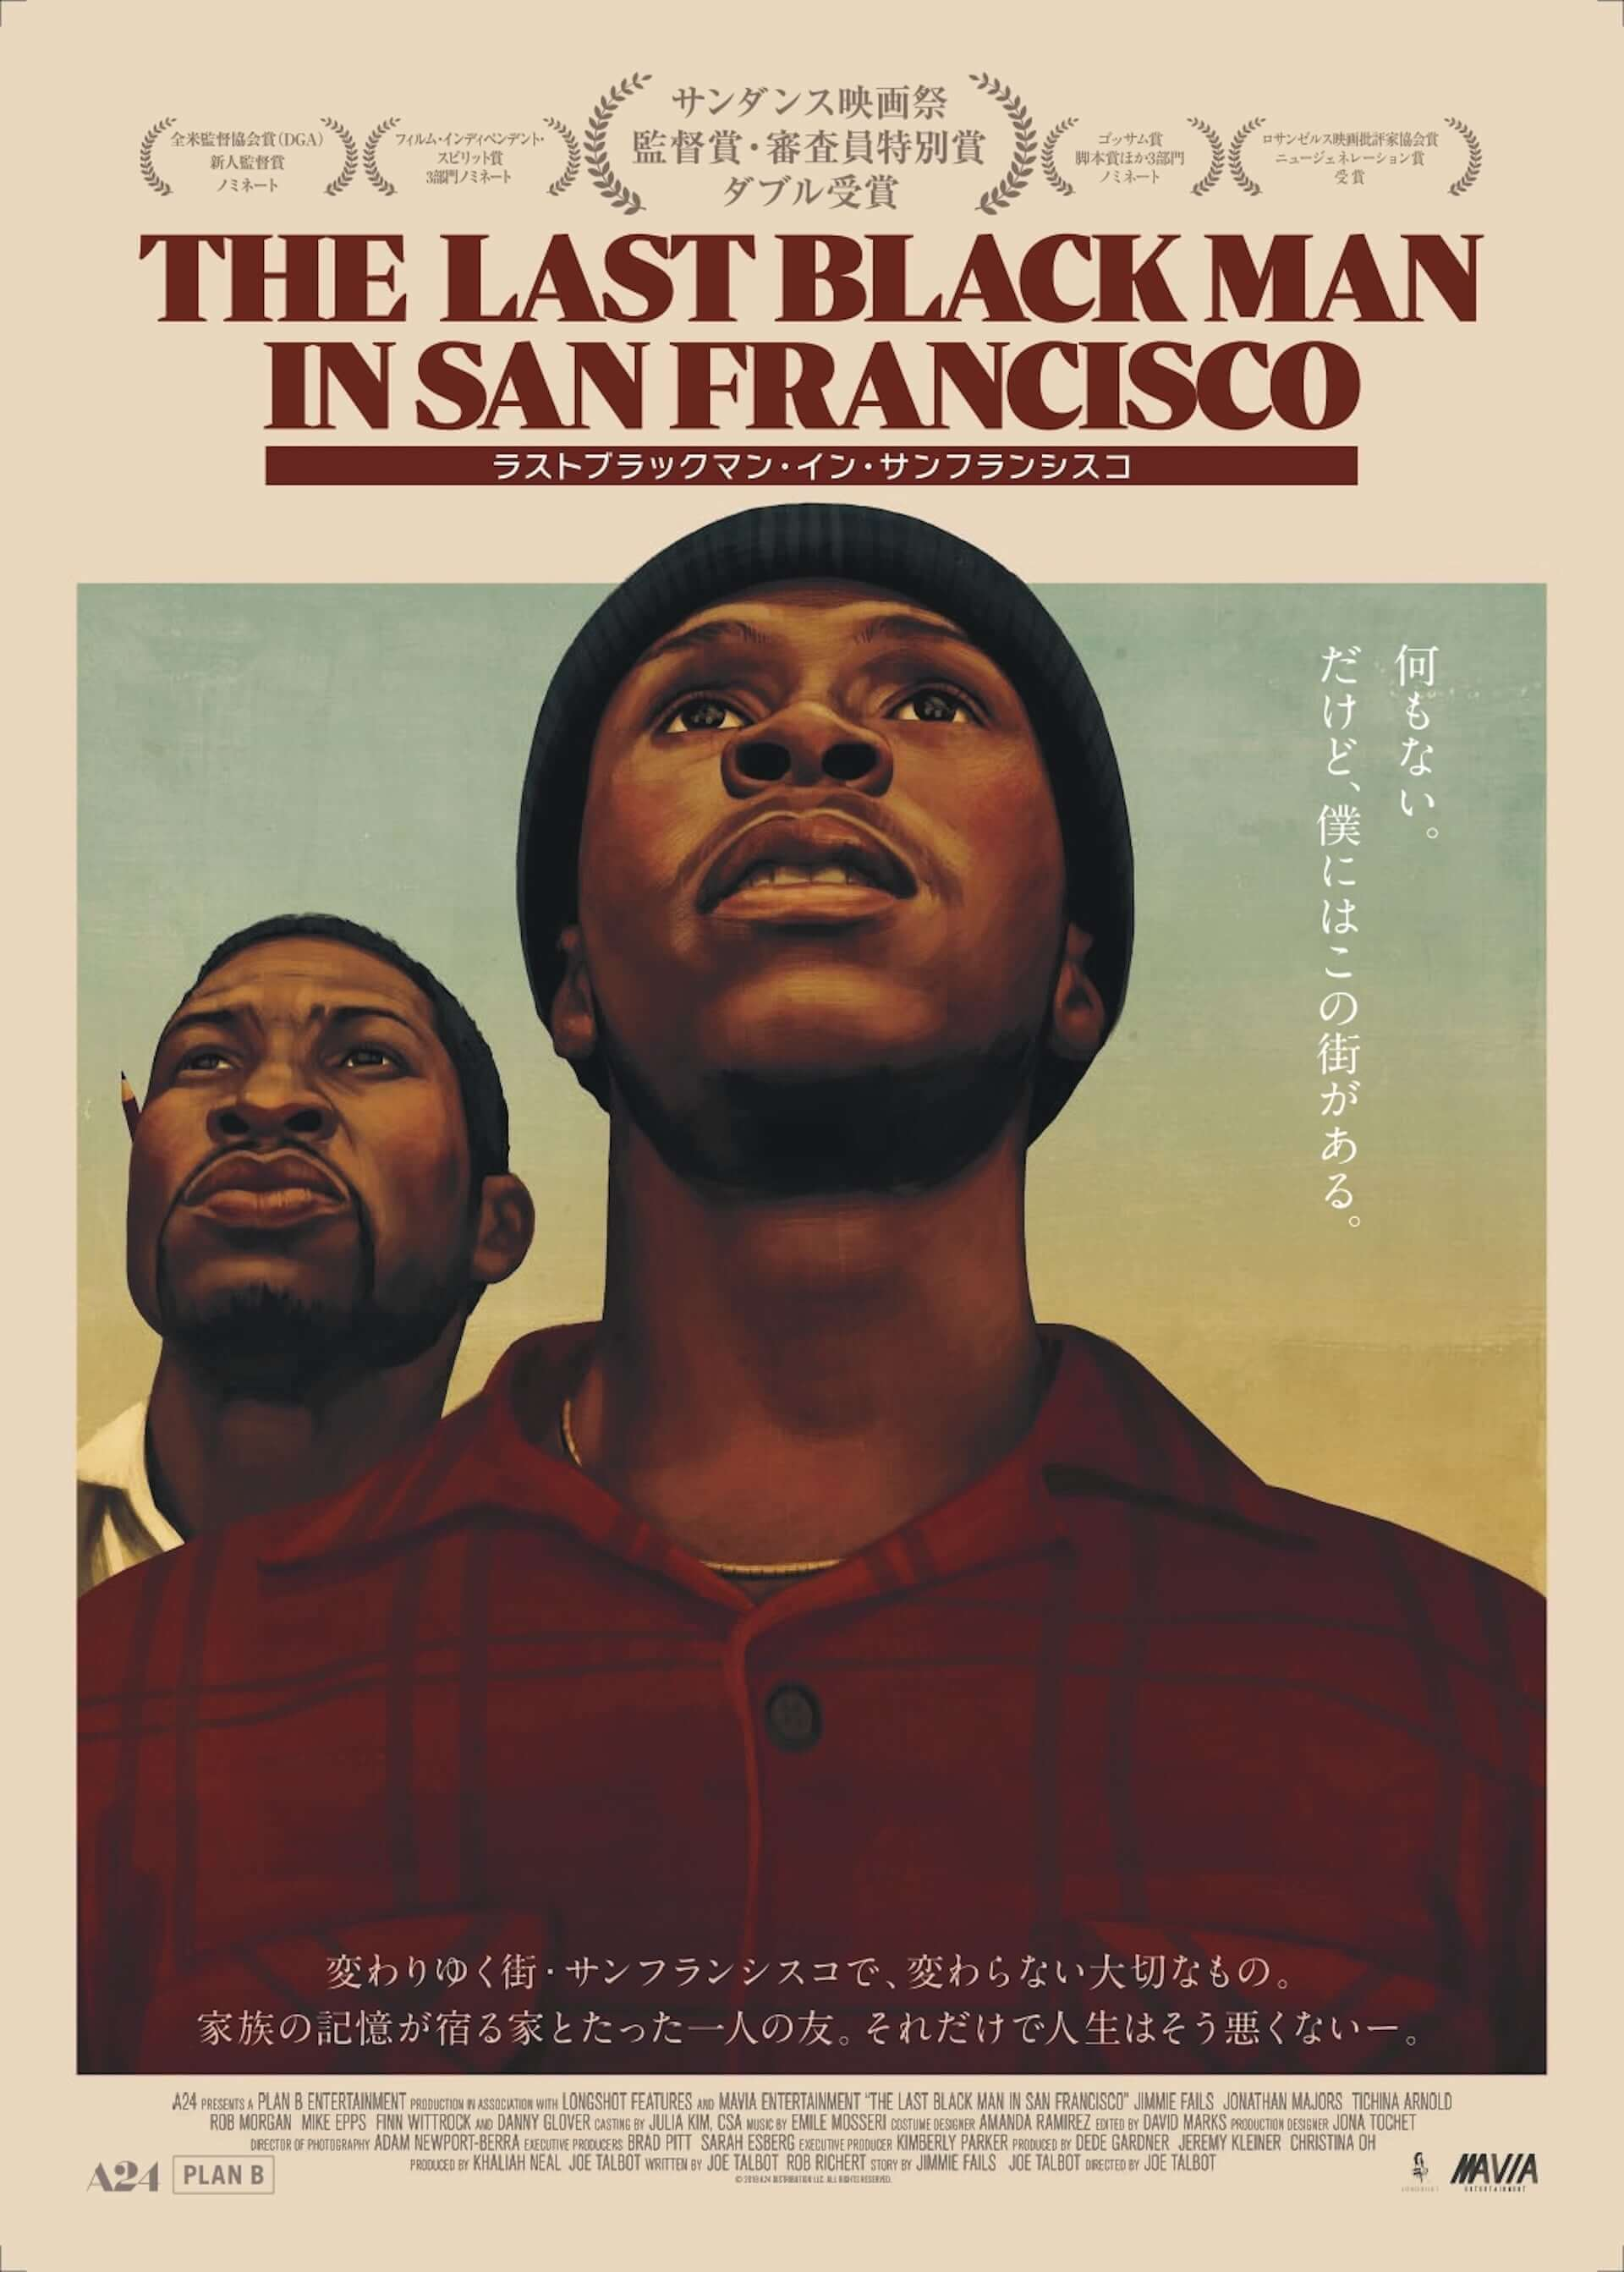 A24とプランBの再タッグとなる最新作『ラストブラックマン・イン・サンフランシスコ』新場面写真が解禁!ジョー・タルボット監督のコメントも到着 film200808_lastblackman_1-1920x2686